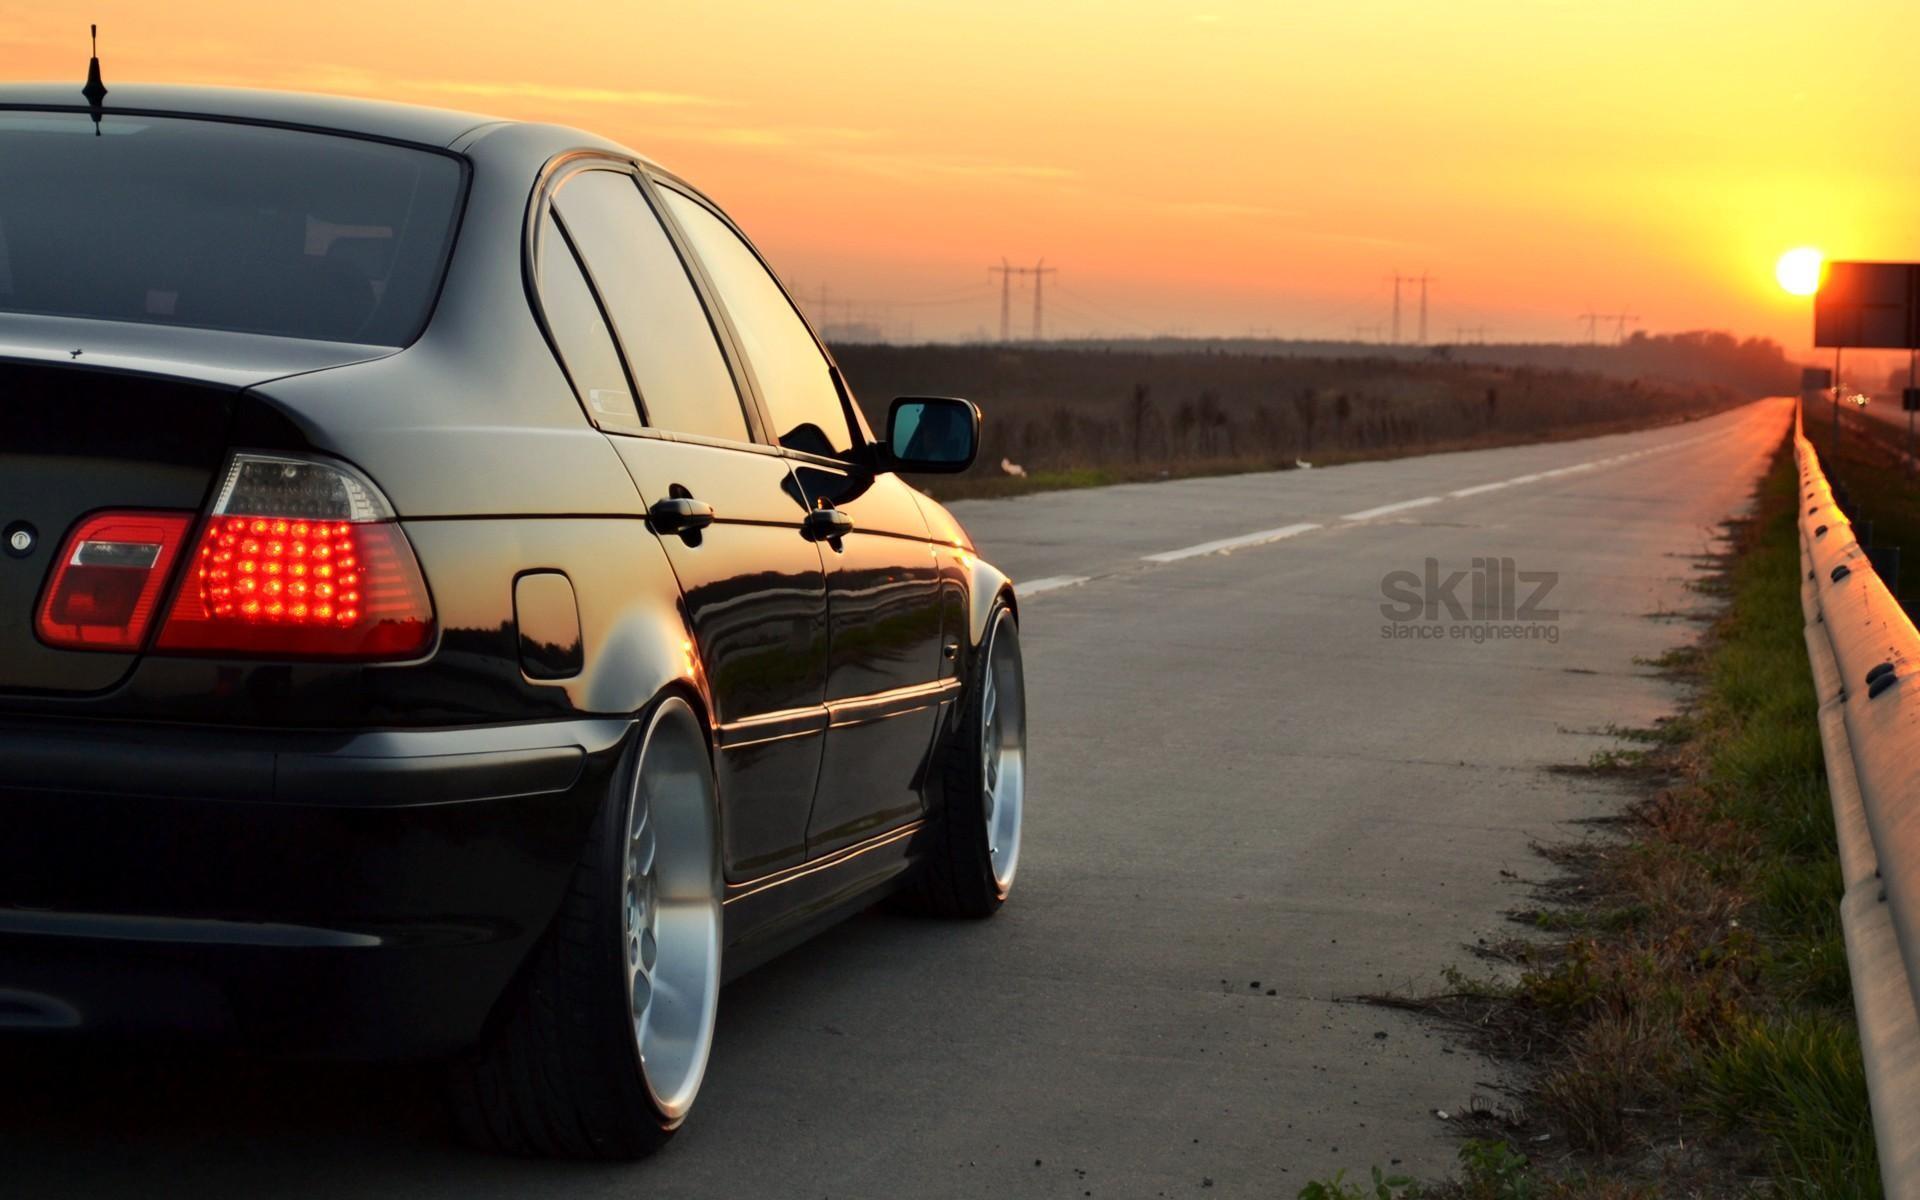 BMW M3 E46 Wallpaper 69 images 1920x1200